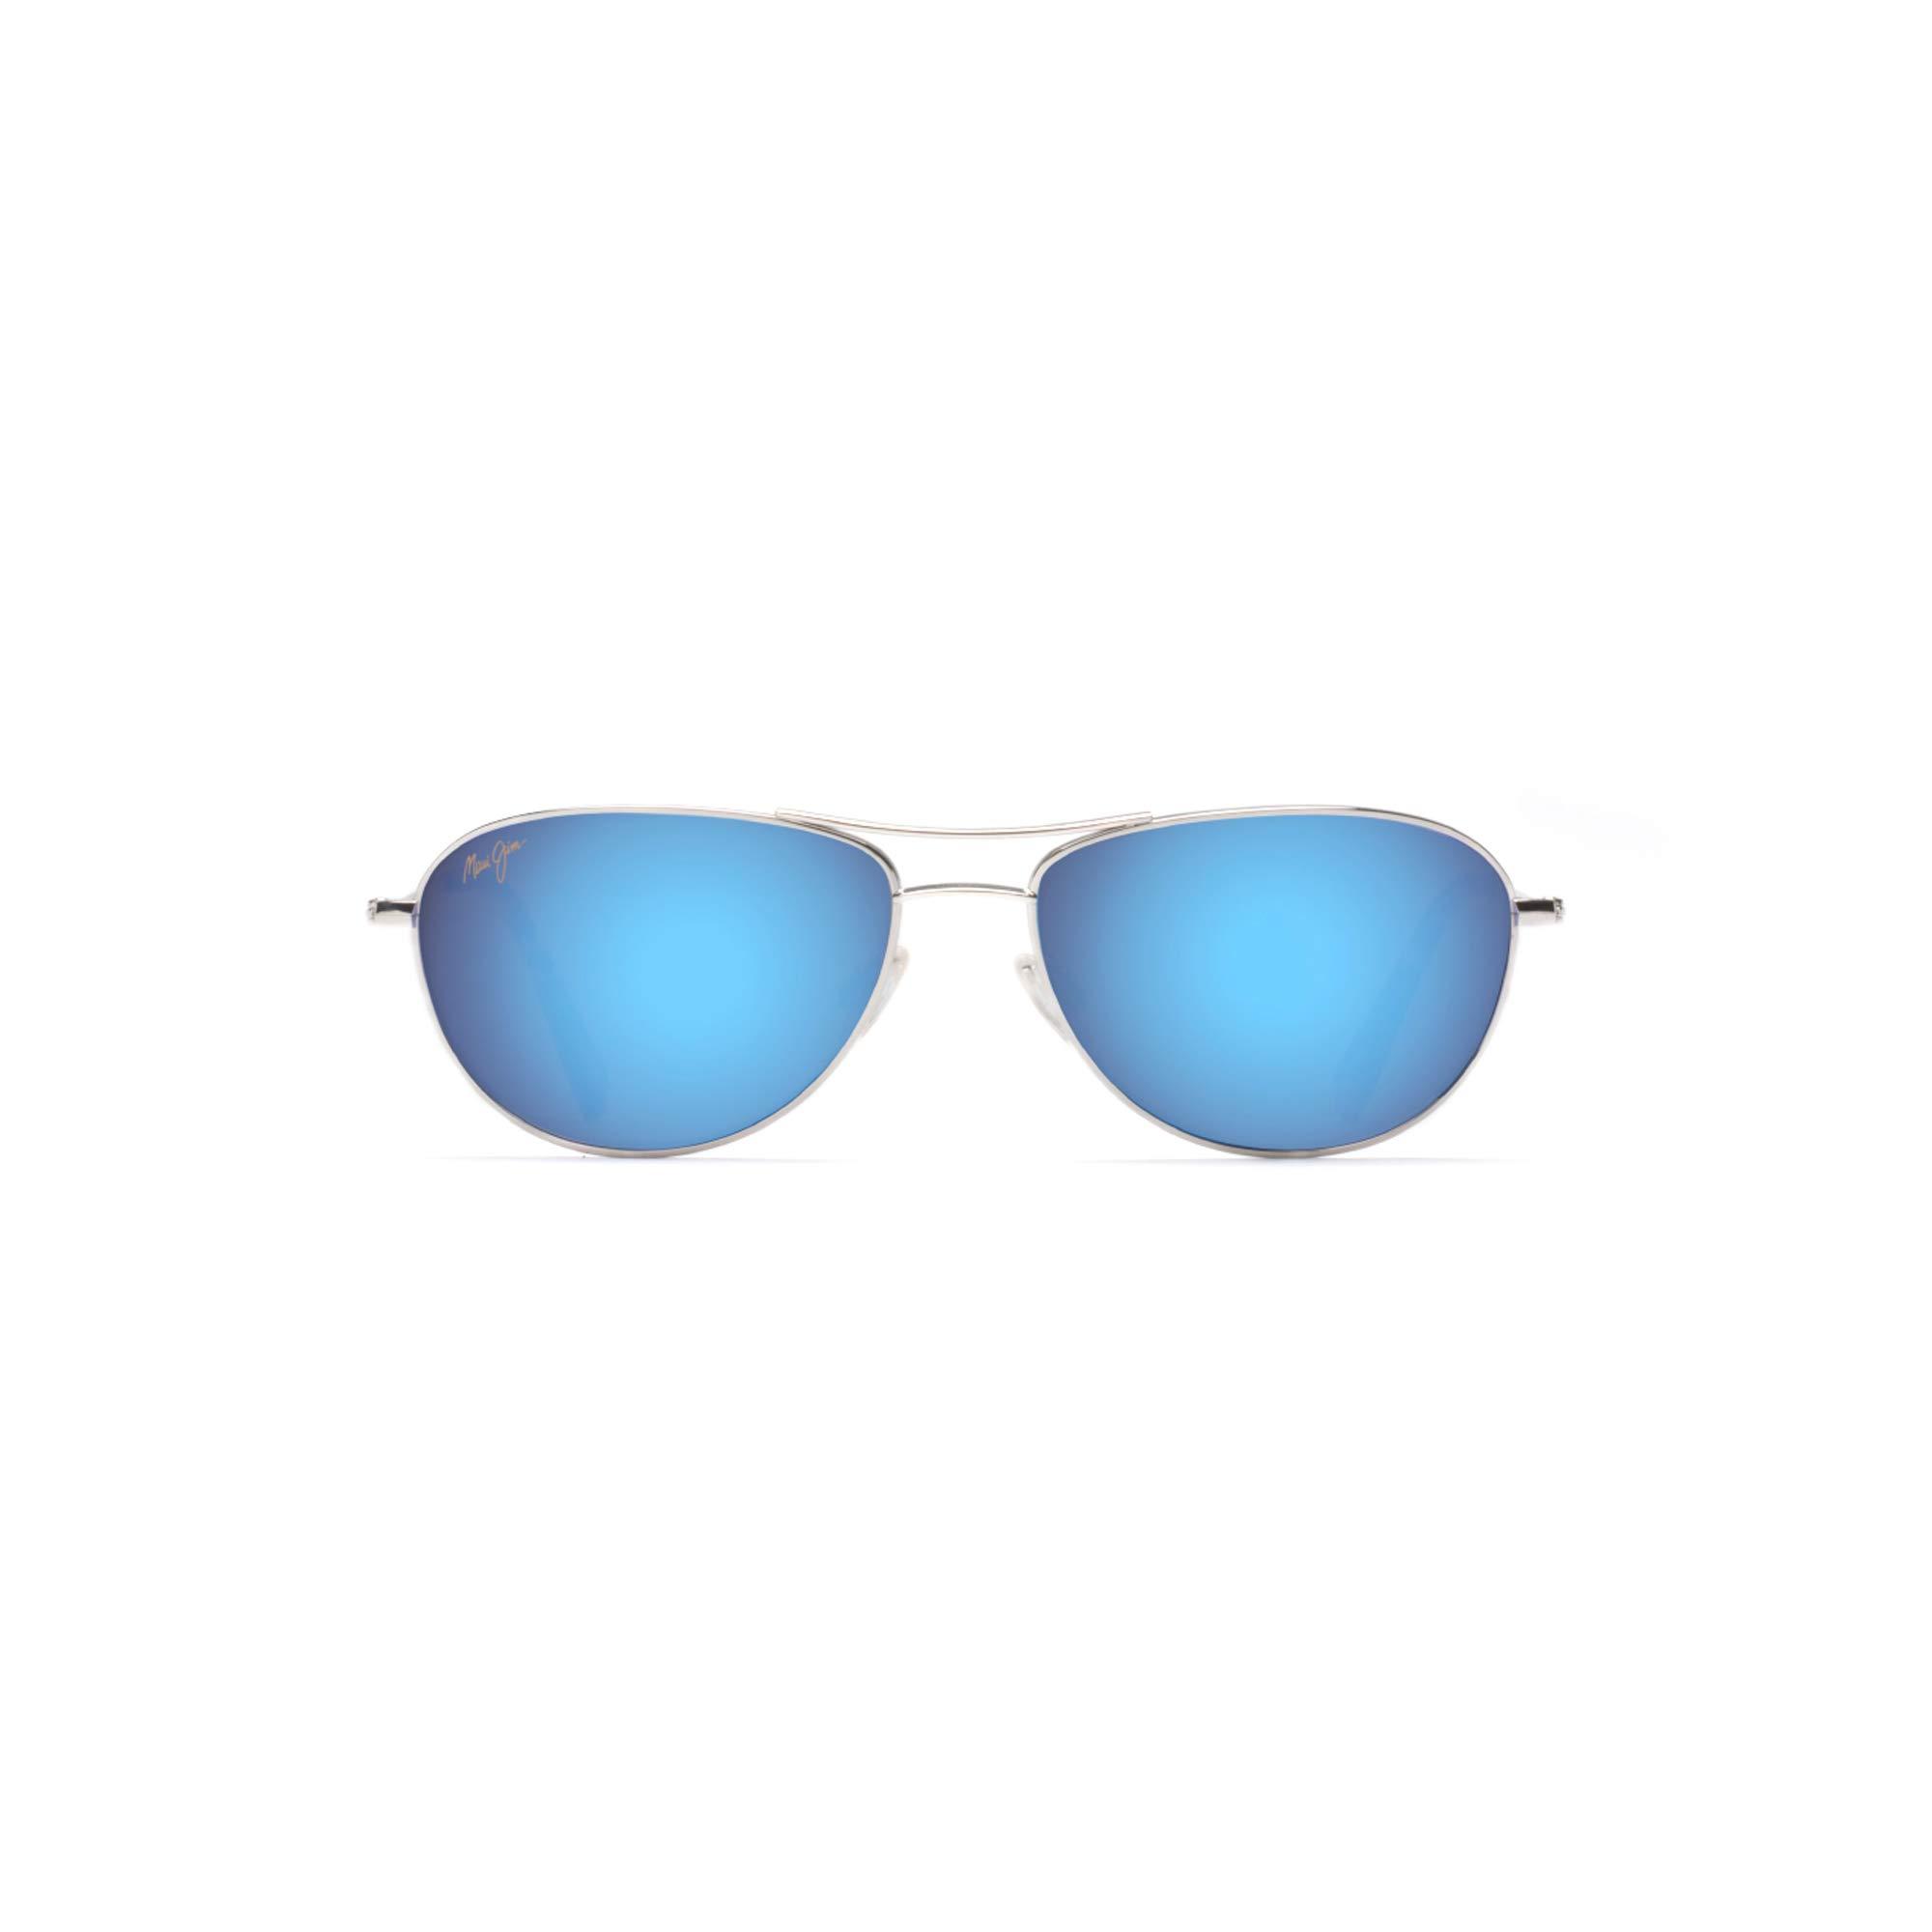 ویکالا · خرید  اصل اورجینال · خرید از آمازون · Maui Jim Sunglasses | Baby Beach B245-17, Silver with Blue, with Patented PolarizedPlus2 Lens Technology wekala · ویکالا